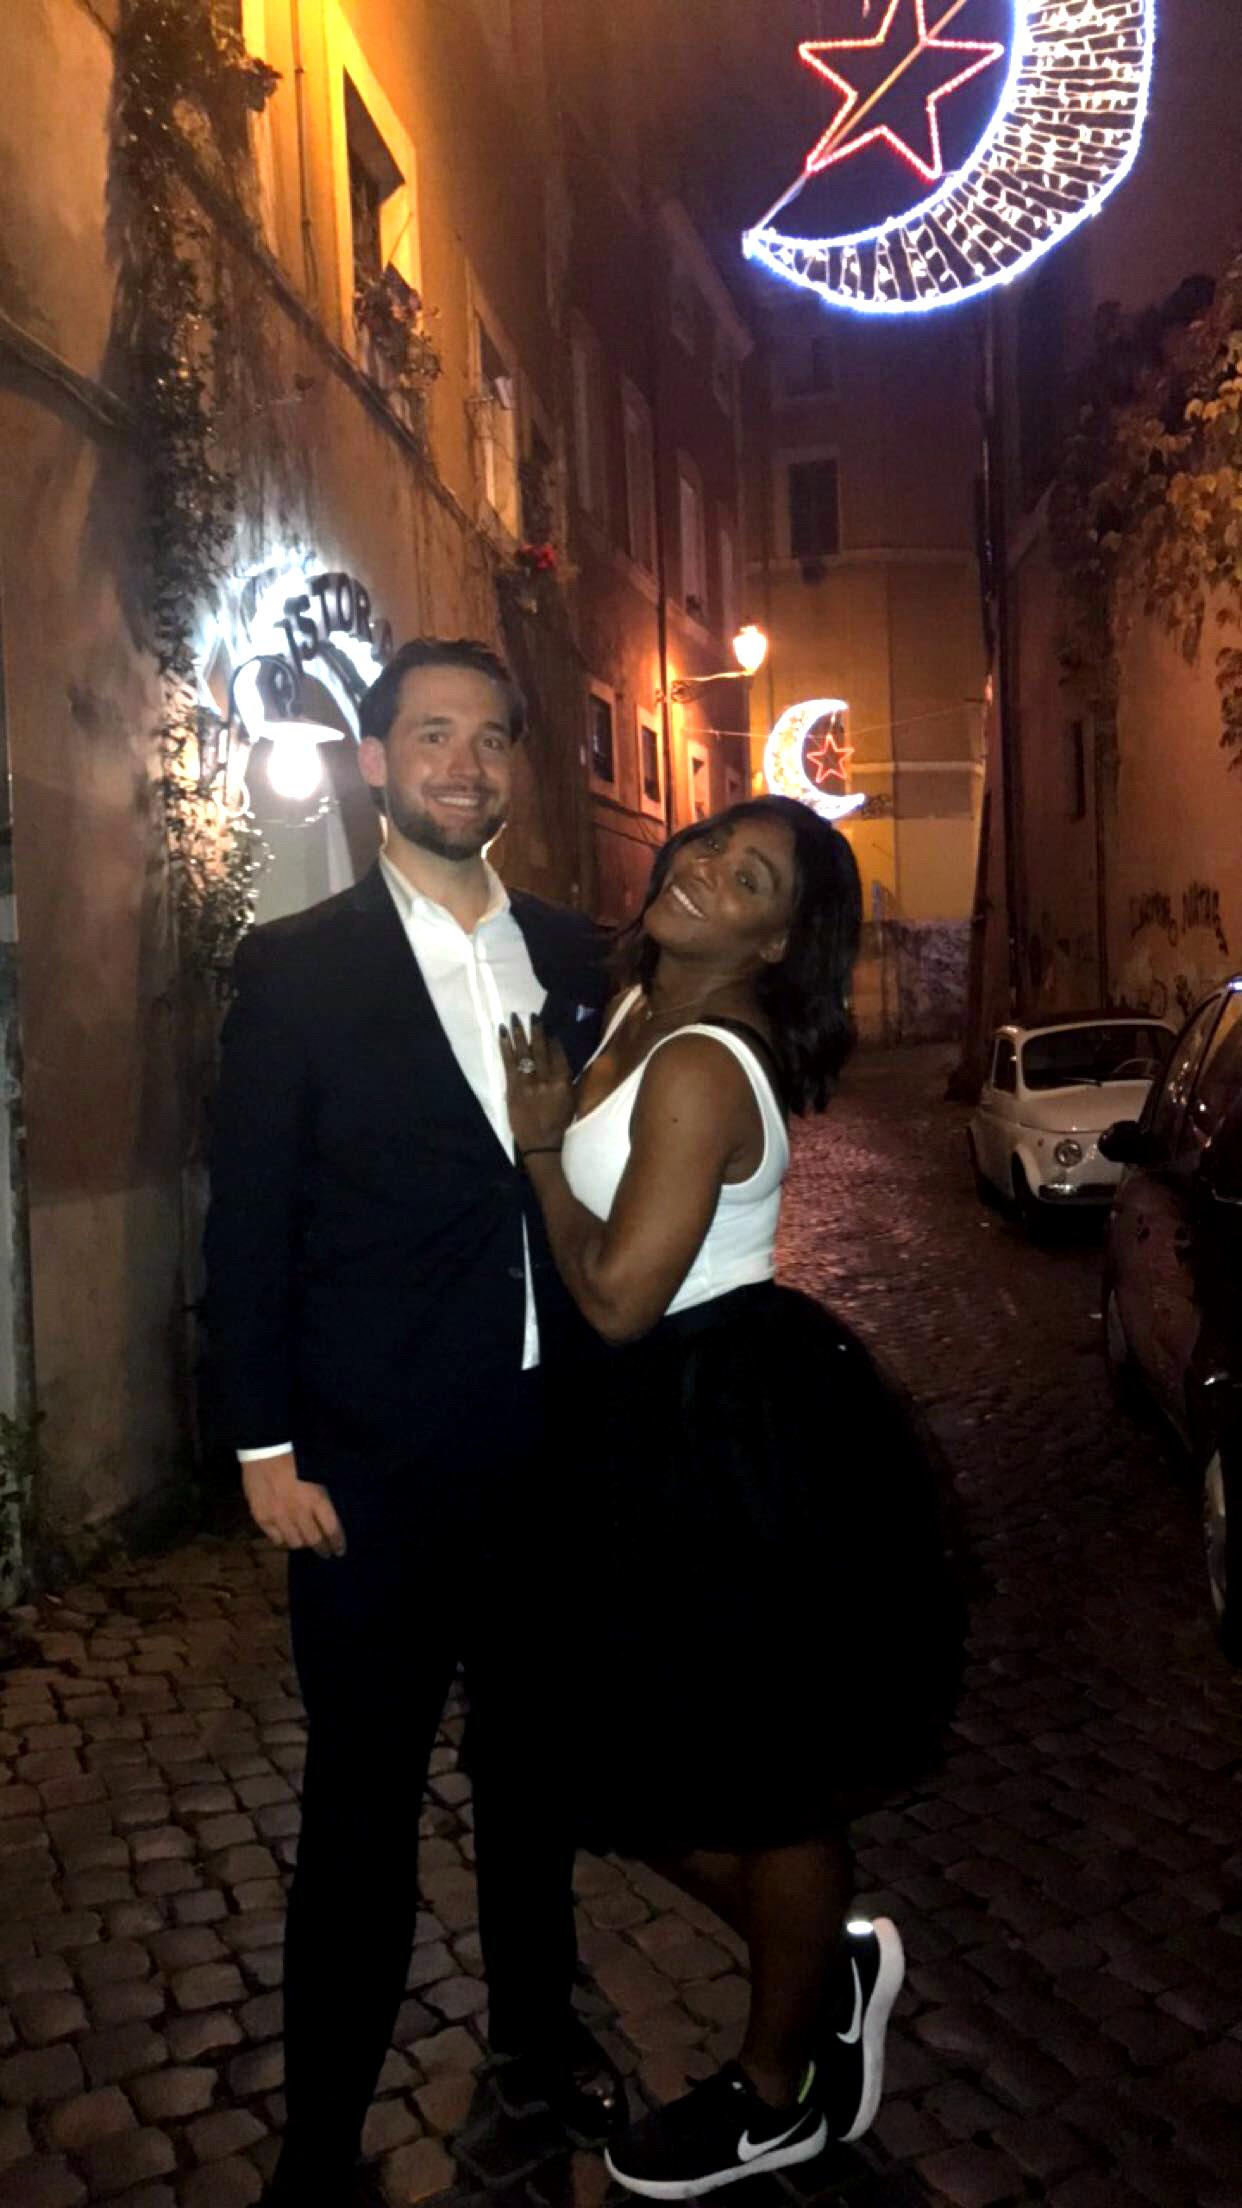 Serena Williams datant Reddit rencontres Interracial dans Charlotte NC